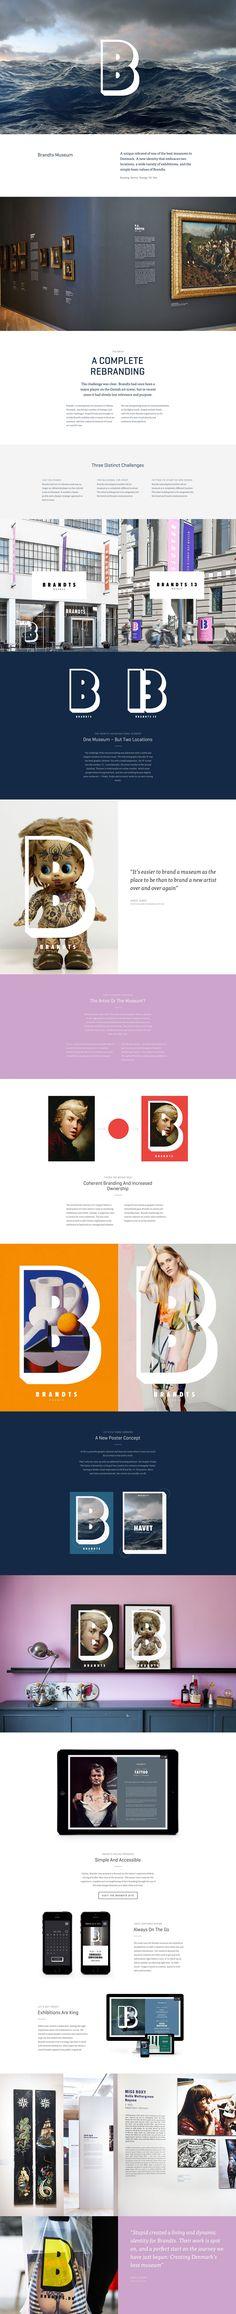 Brandts Museum rebranding by Bjarne Christensen and Stupid Studio on Behance